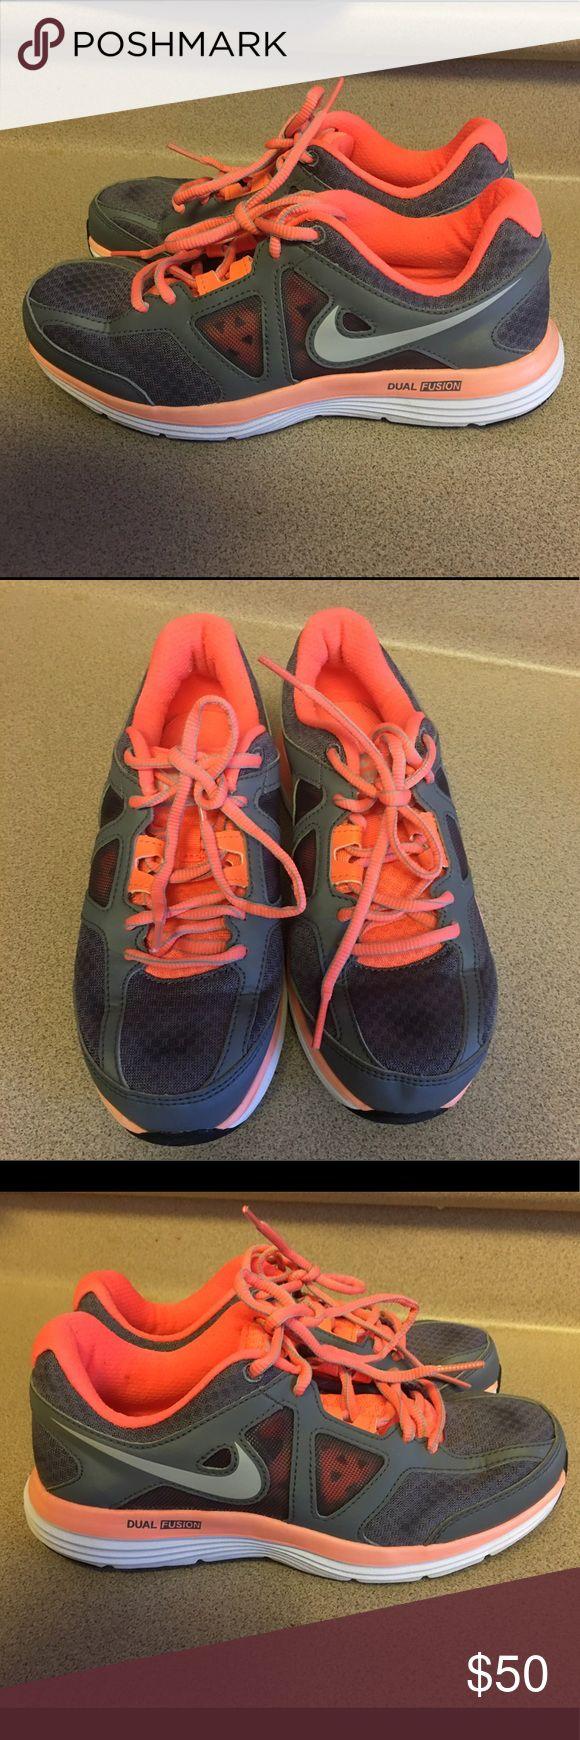 EUC Nike Dual Fusion Lite 2 MSL Womens Size 6.5 Pre-Owned Nike Dual Fusion Lite 2 MSL Womens 642826-007 Running Shoes Size 6.5 Nike Shoes Sneakers